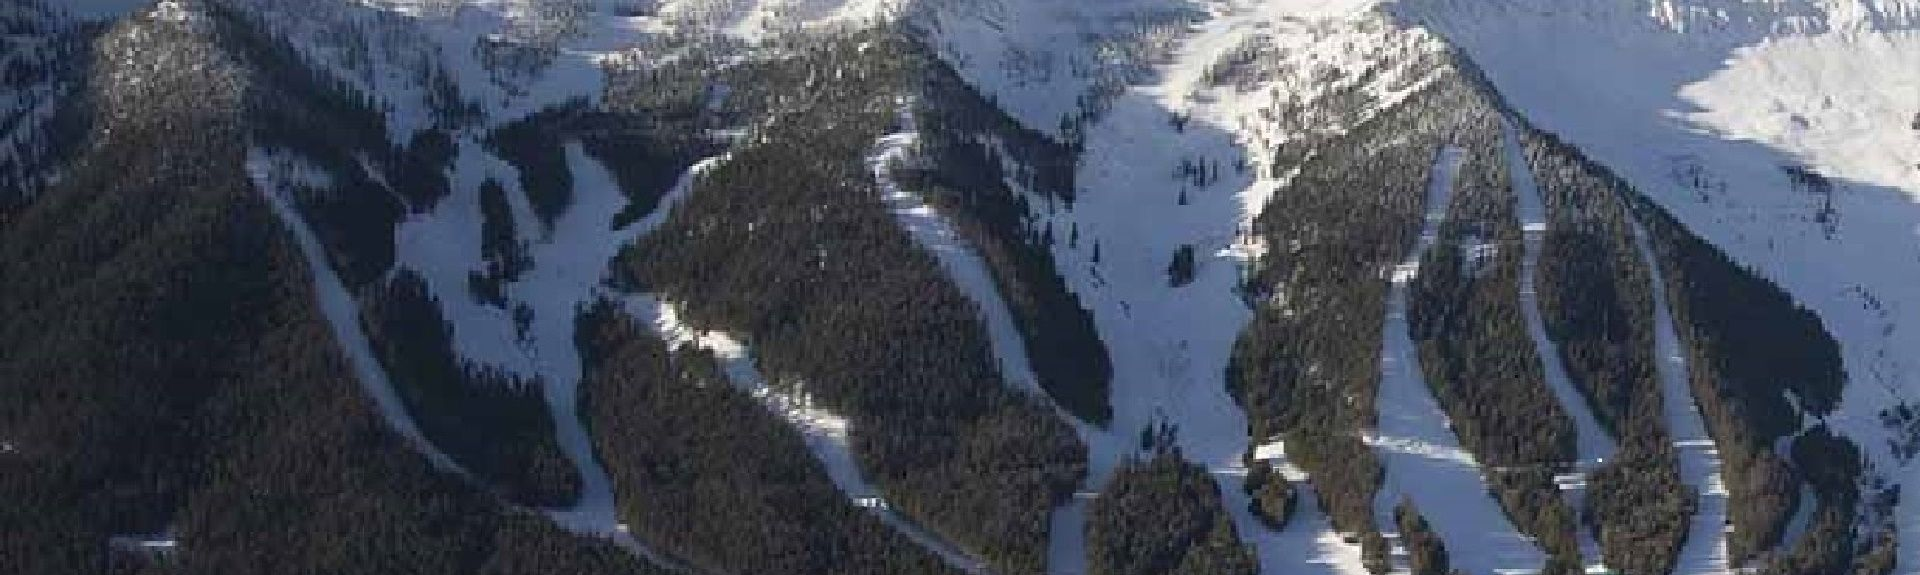 Fernie Alpine Resort (skianlegg), Fernie, British Columbia, Canada